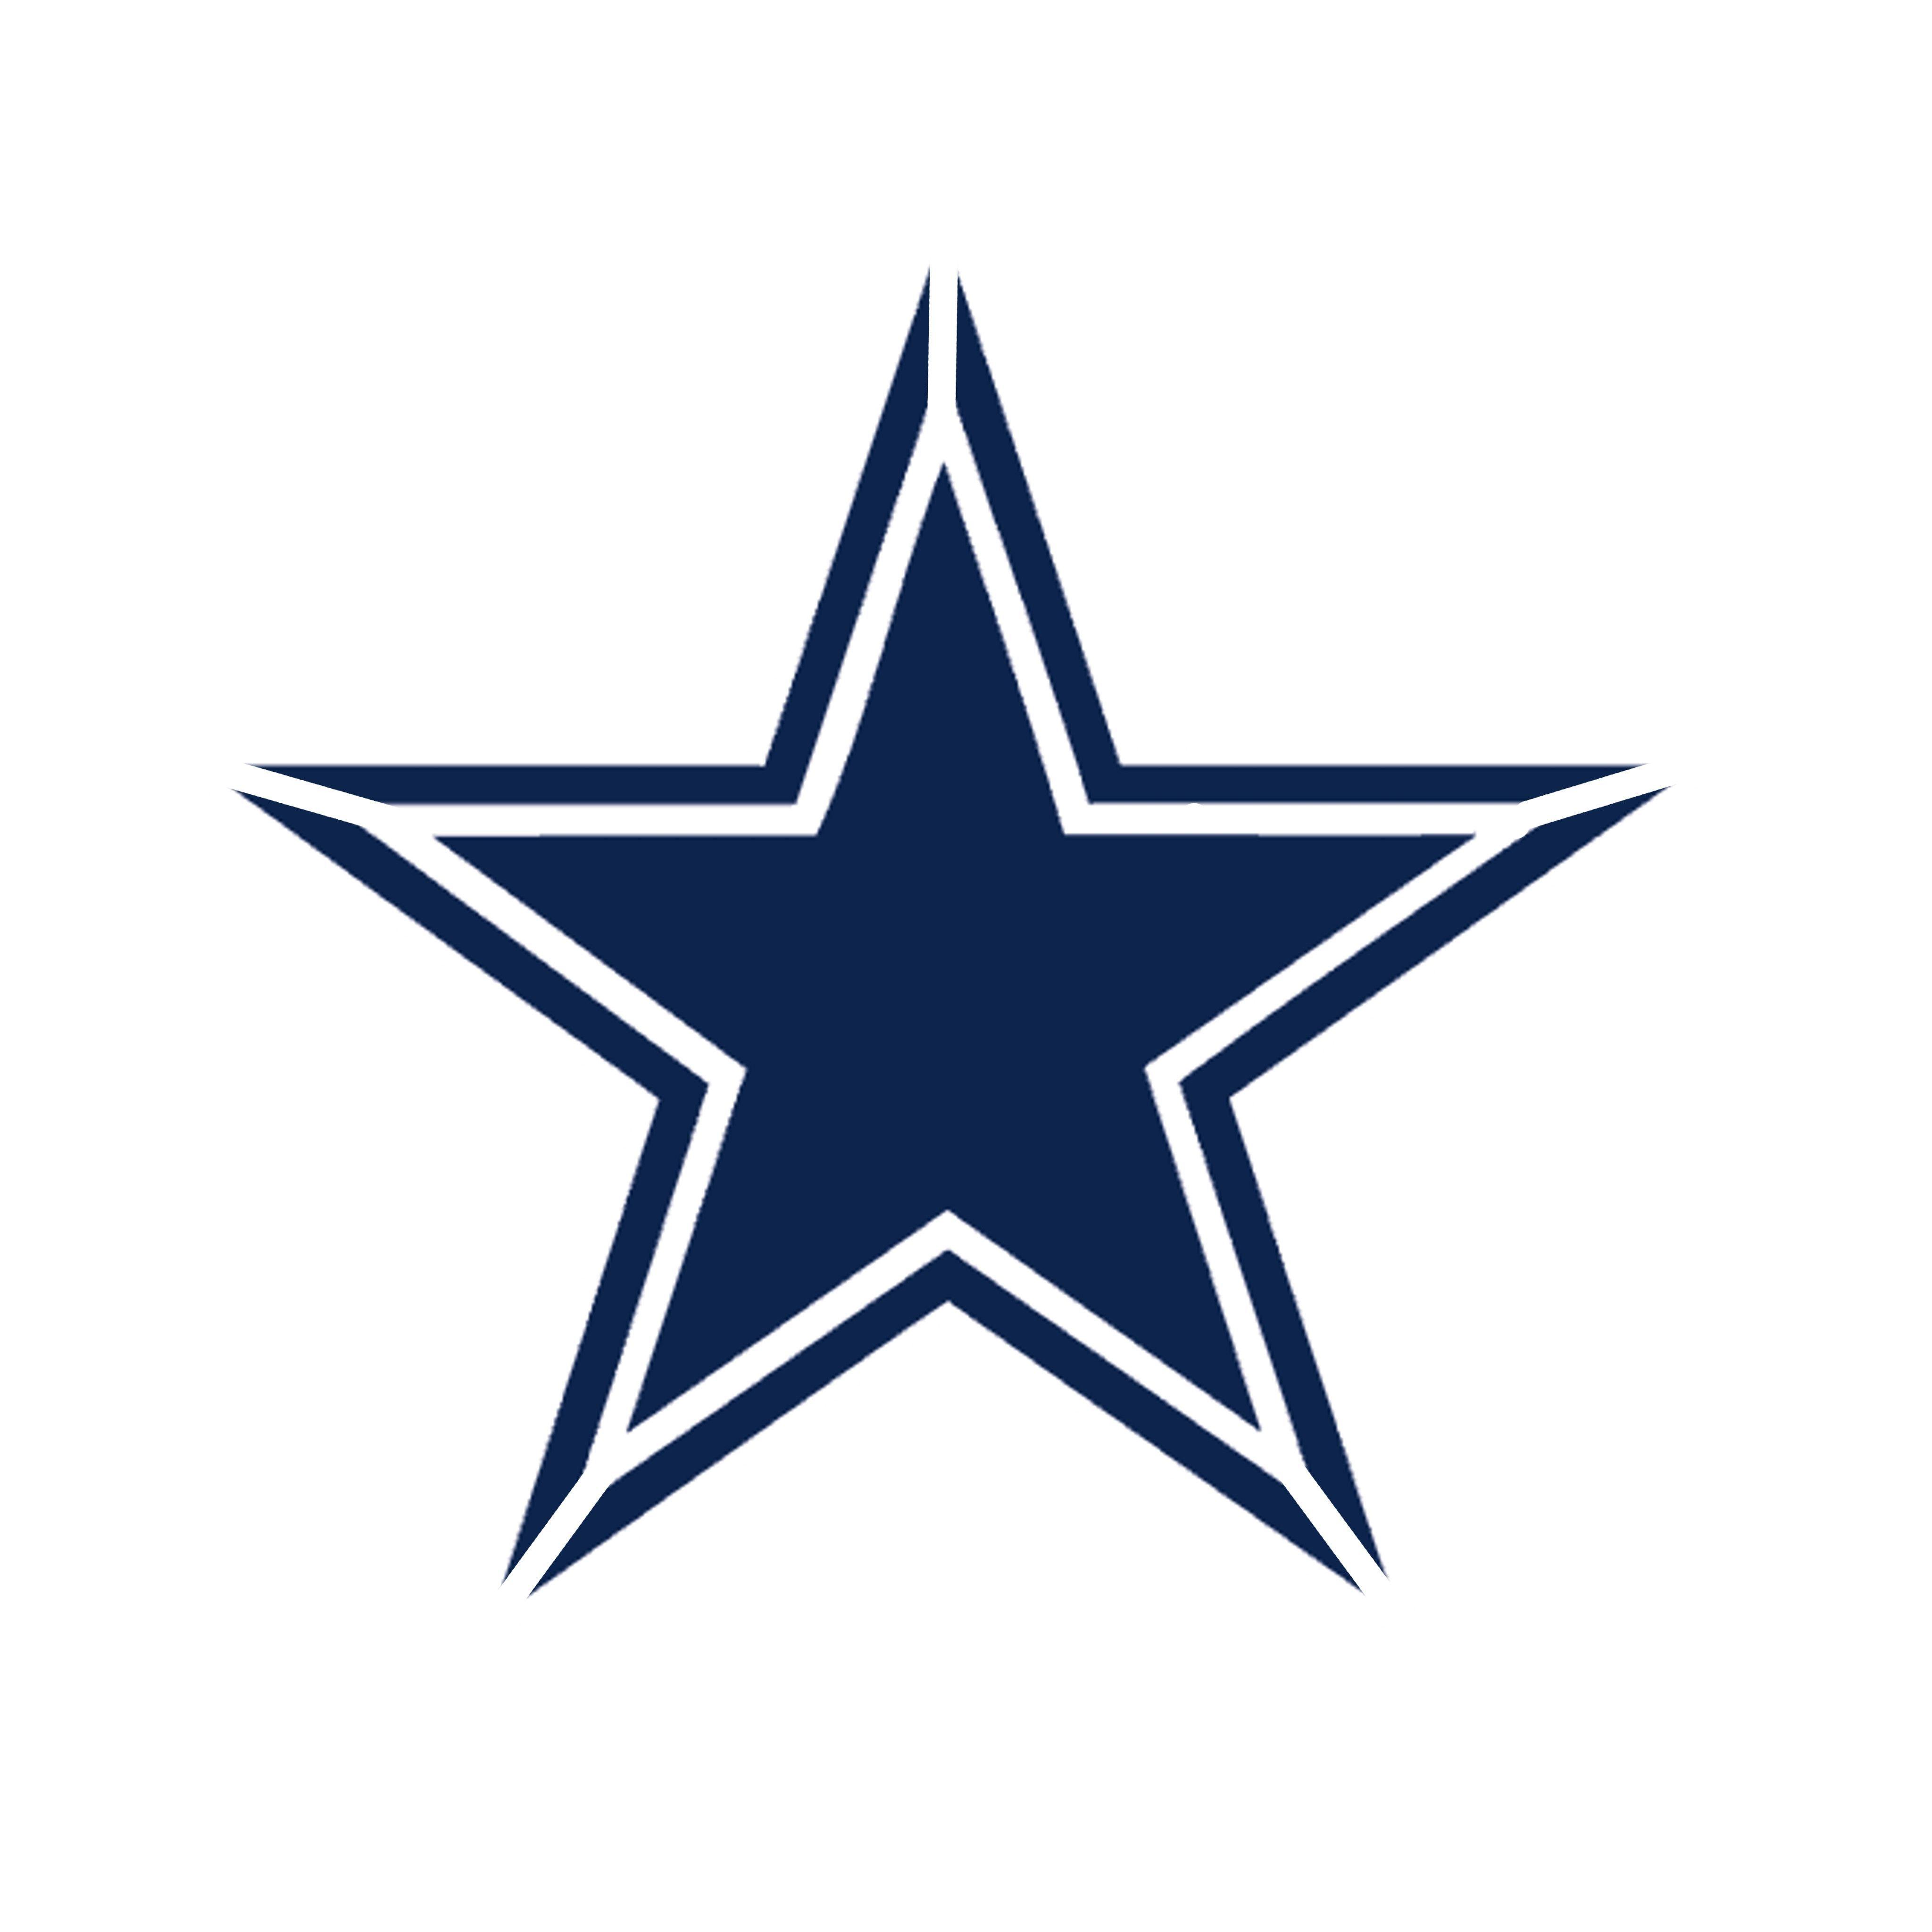 Dallas Cowboy Font and Logo Stencil 10 mil Reusable Patterns